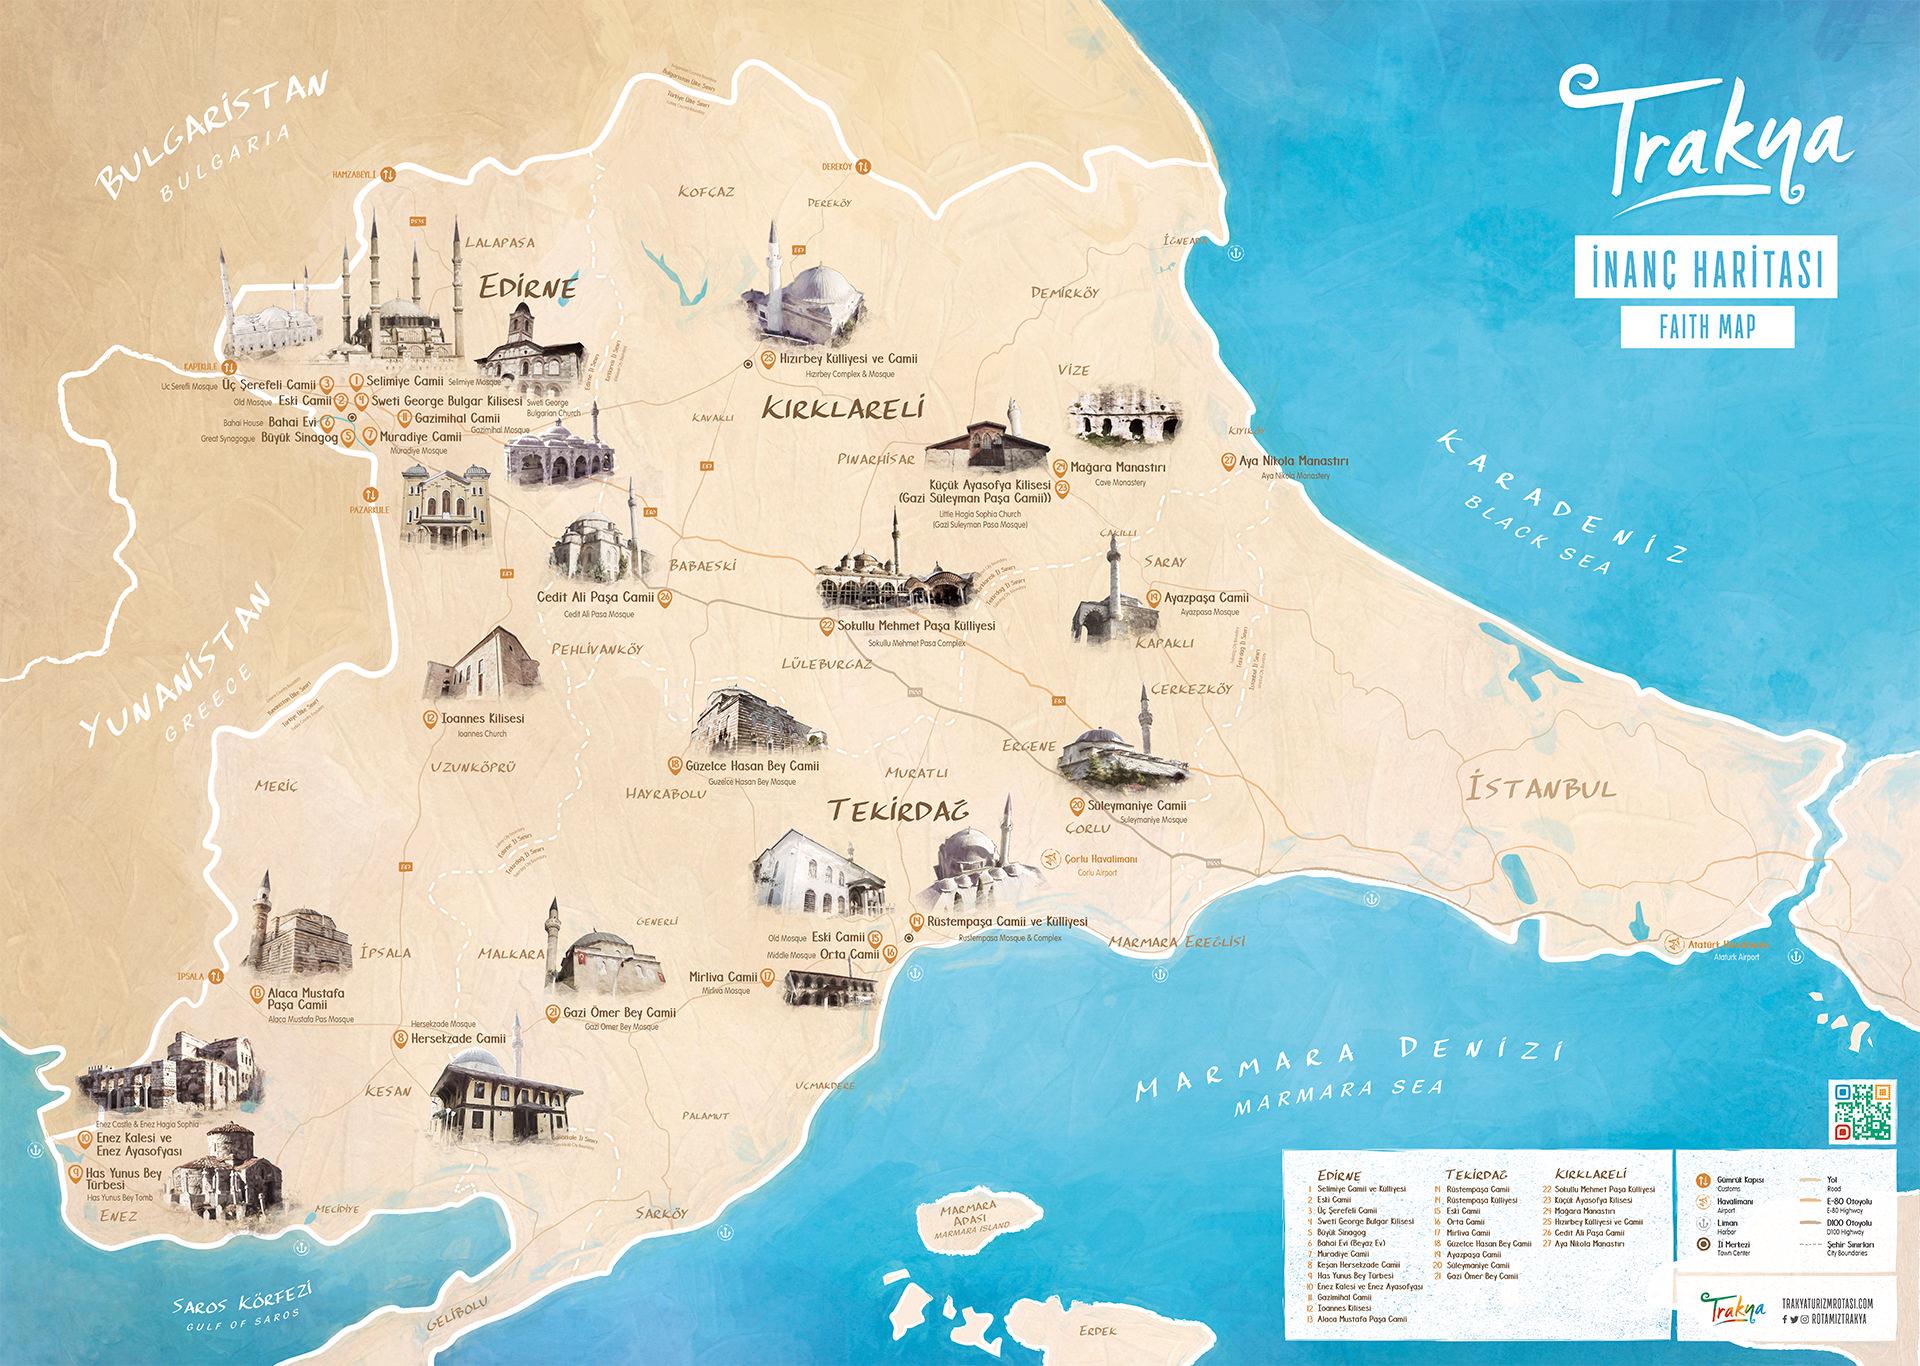 harita_inanc